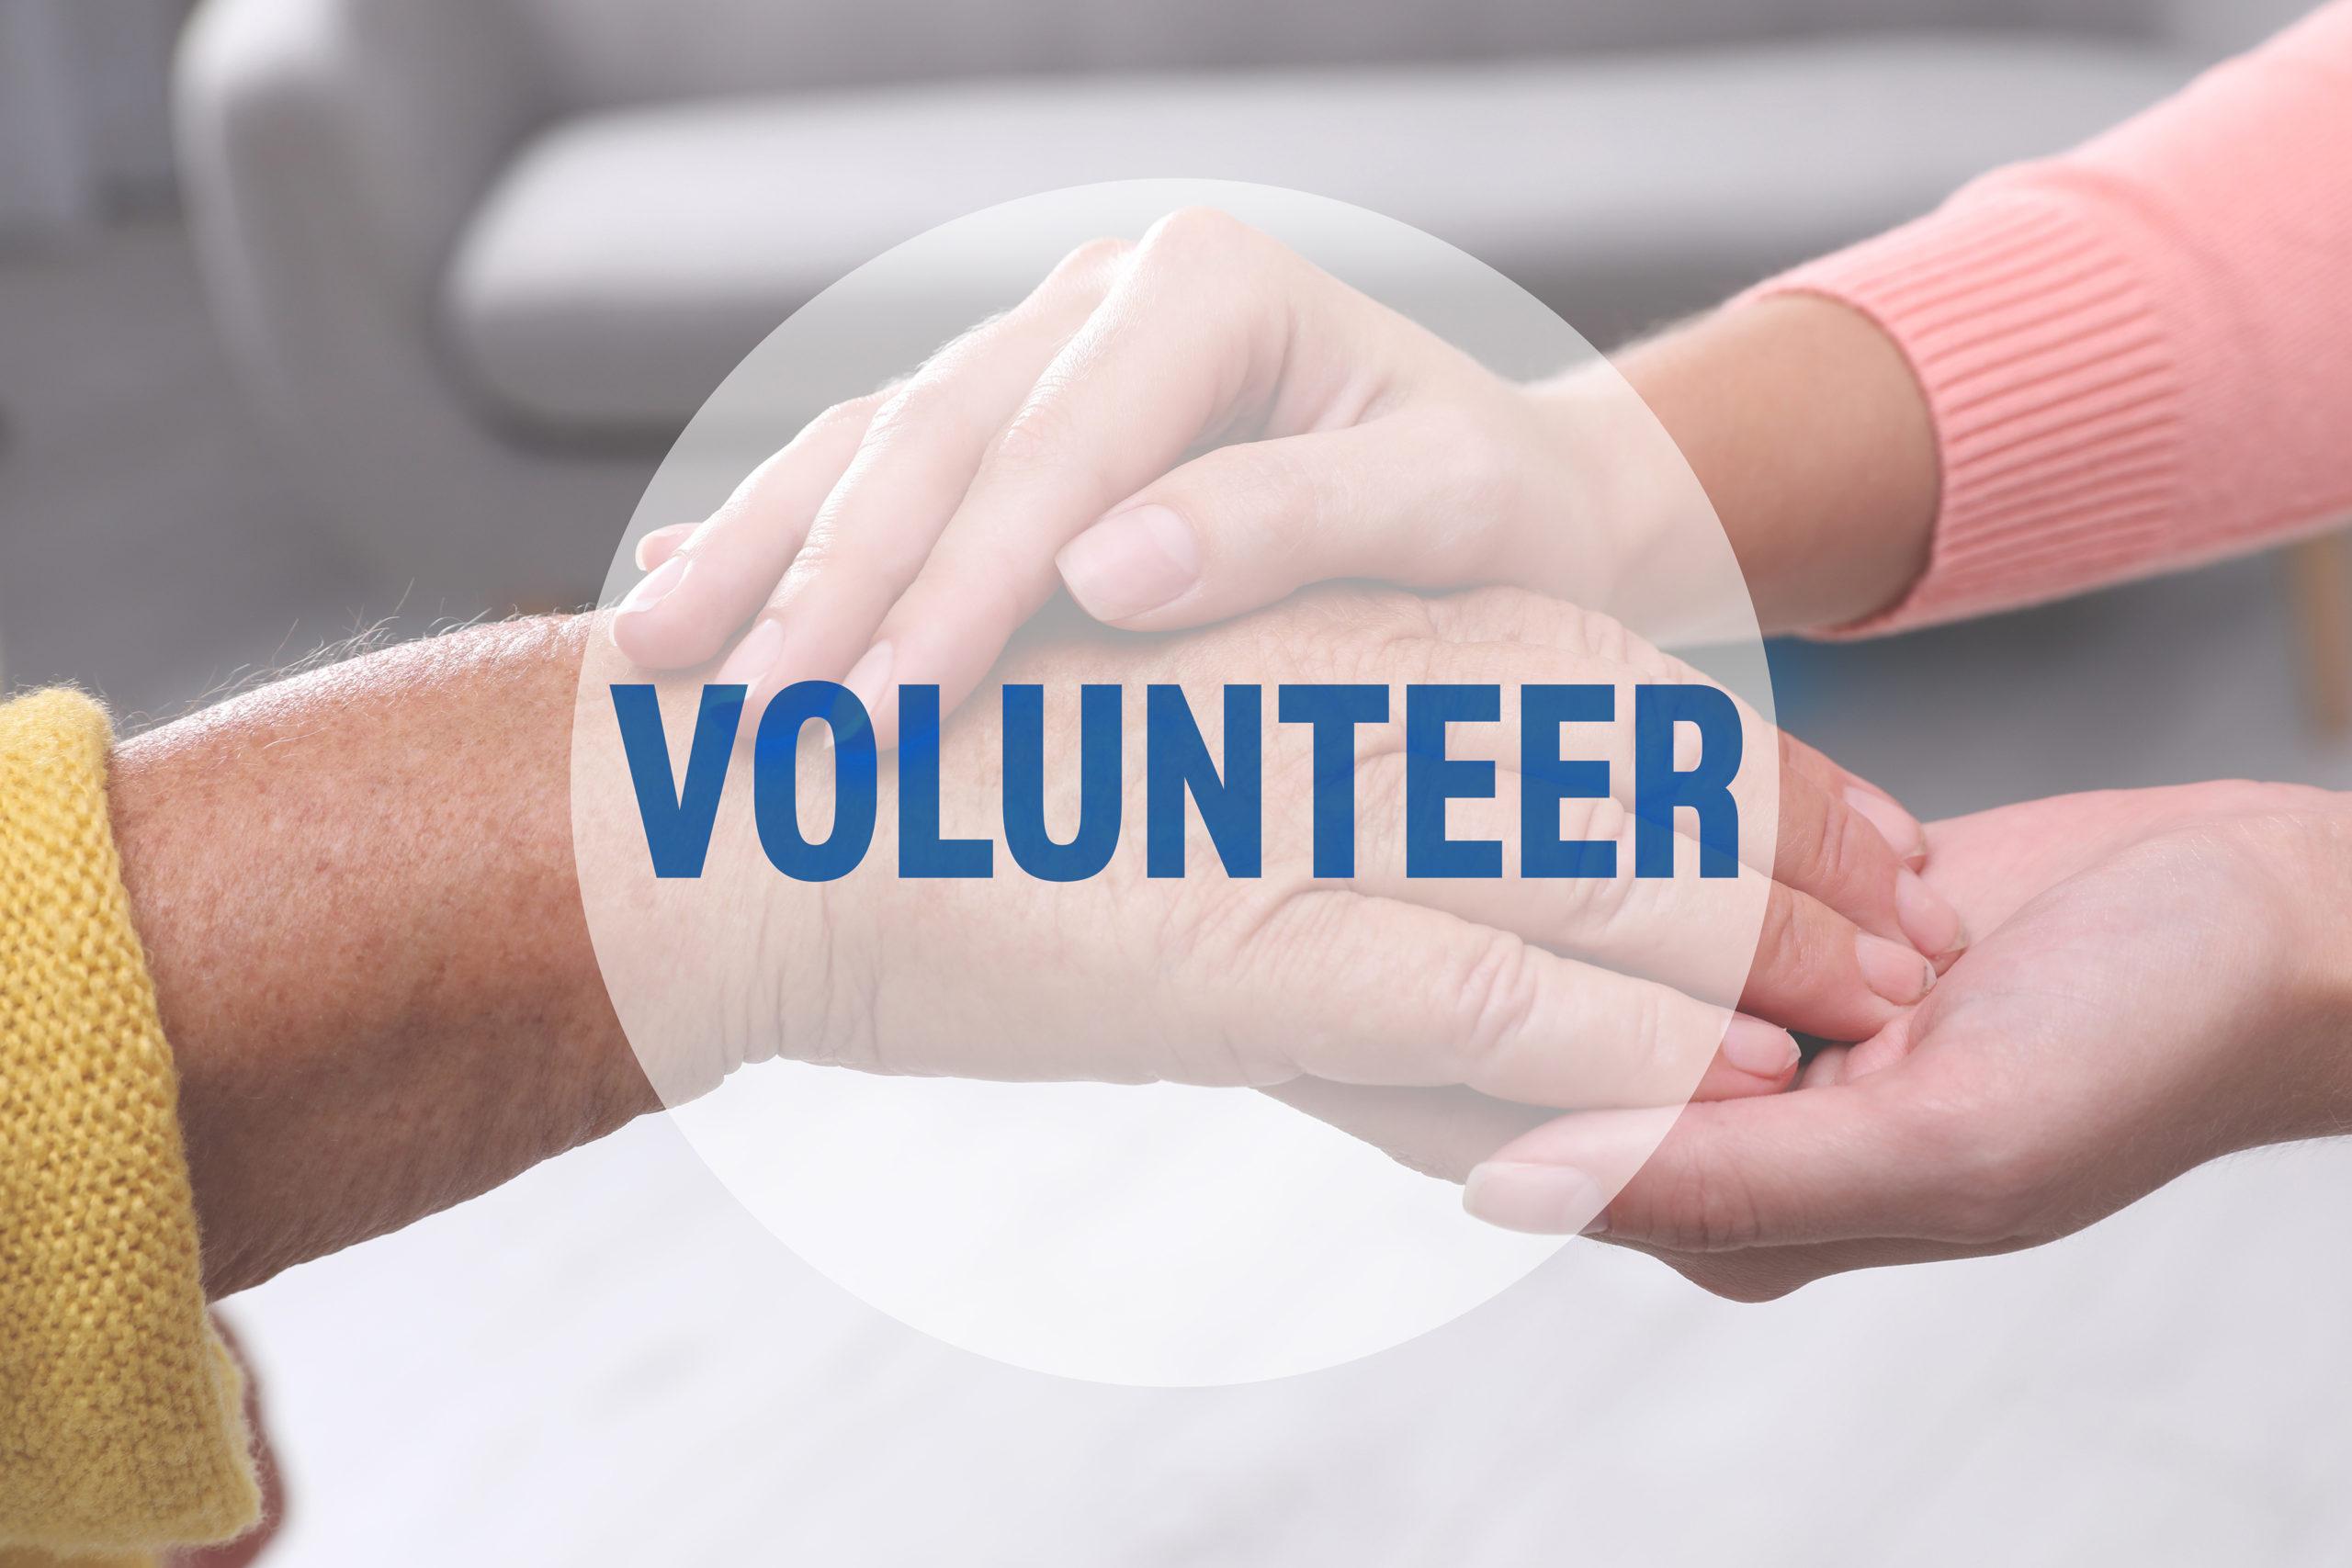 Volunteer Holding Hand Of Senior Woman Indoors, Closeup